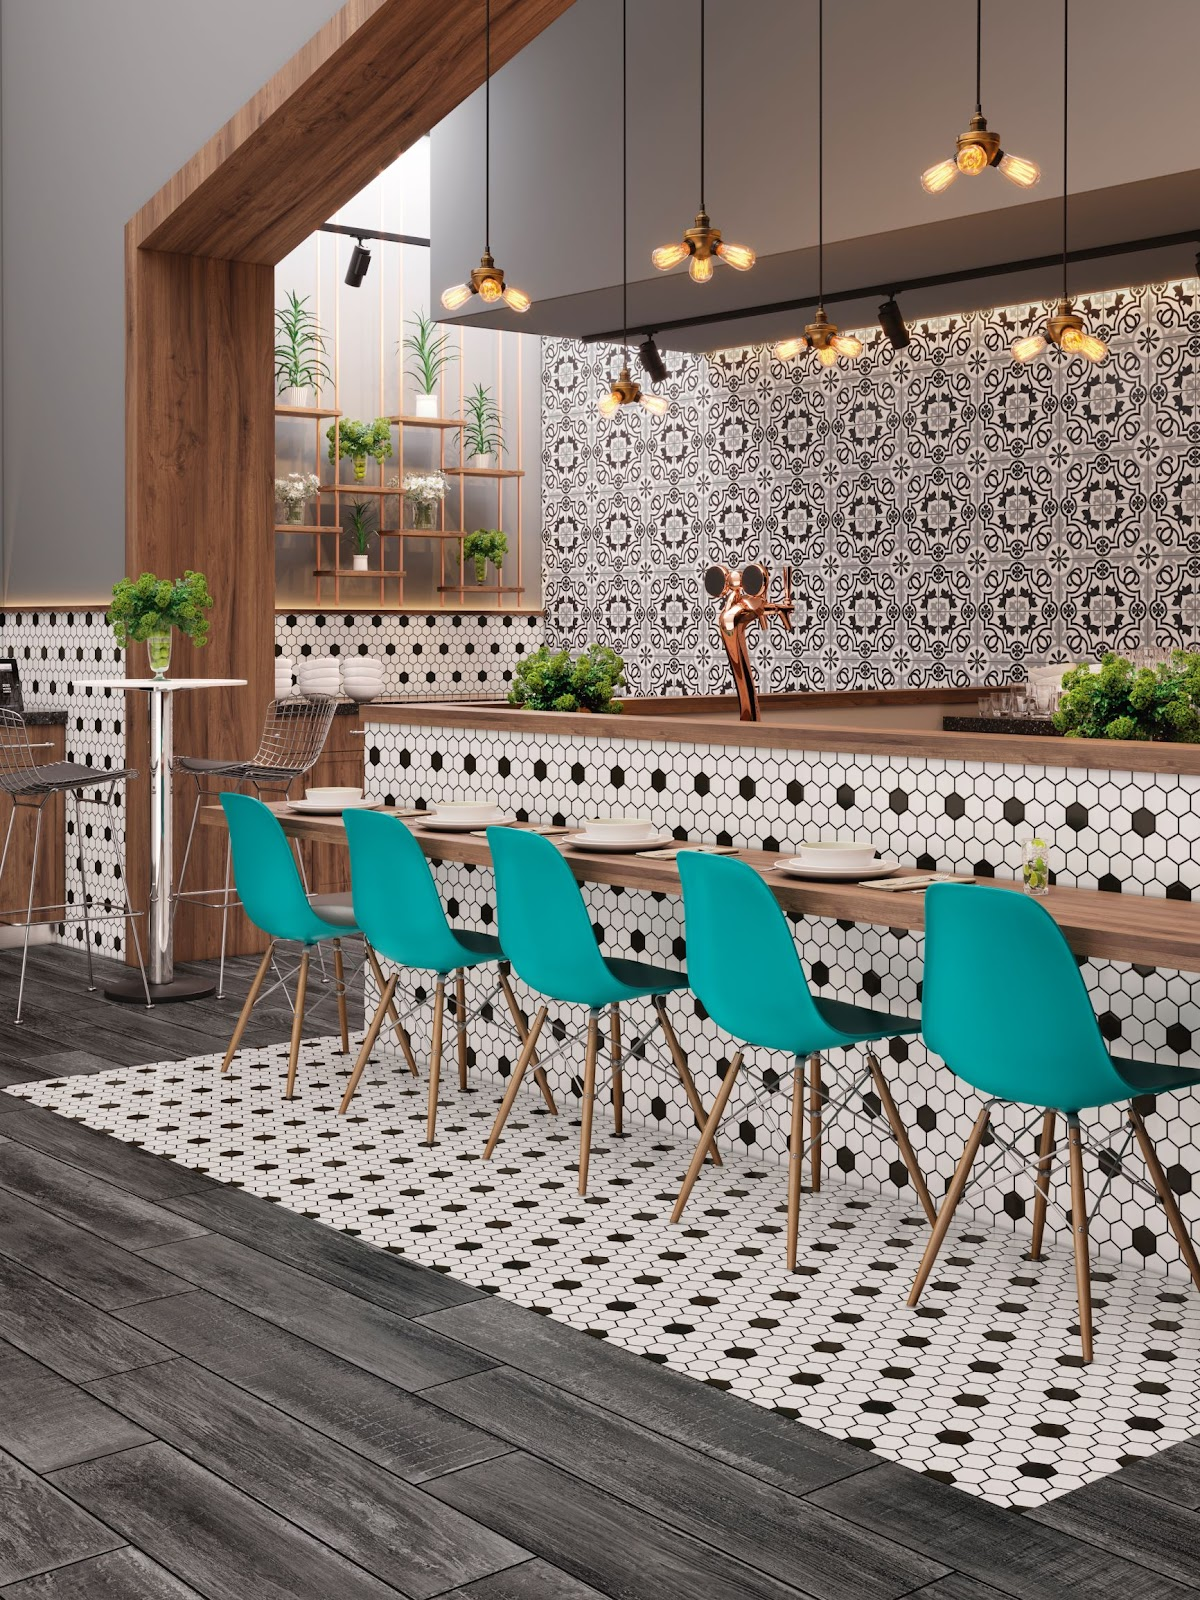 Retro black and white hexagon tile bar front